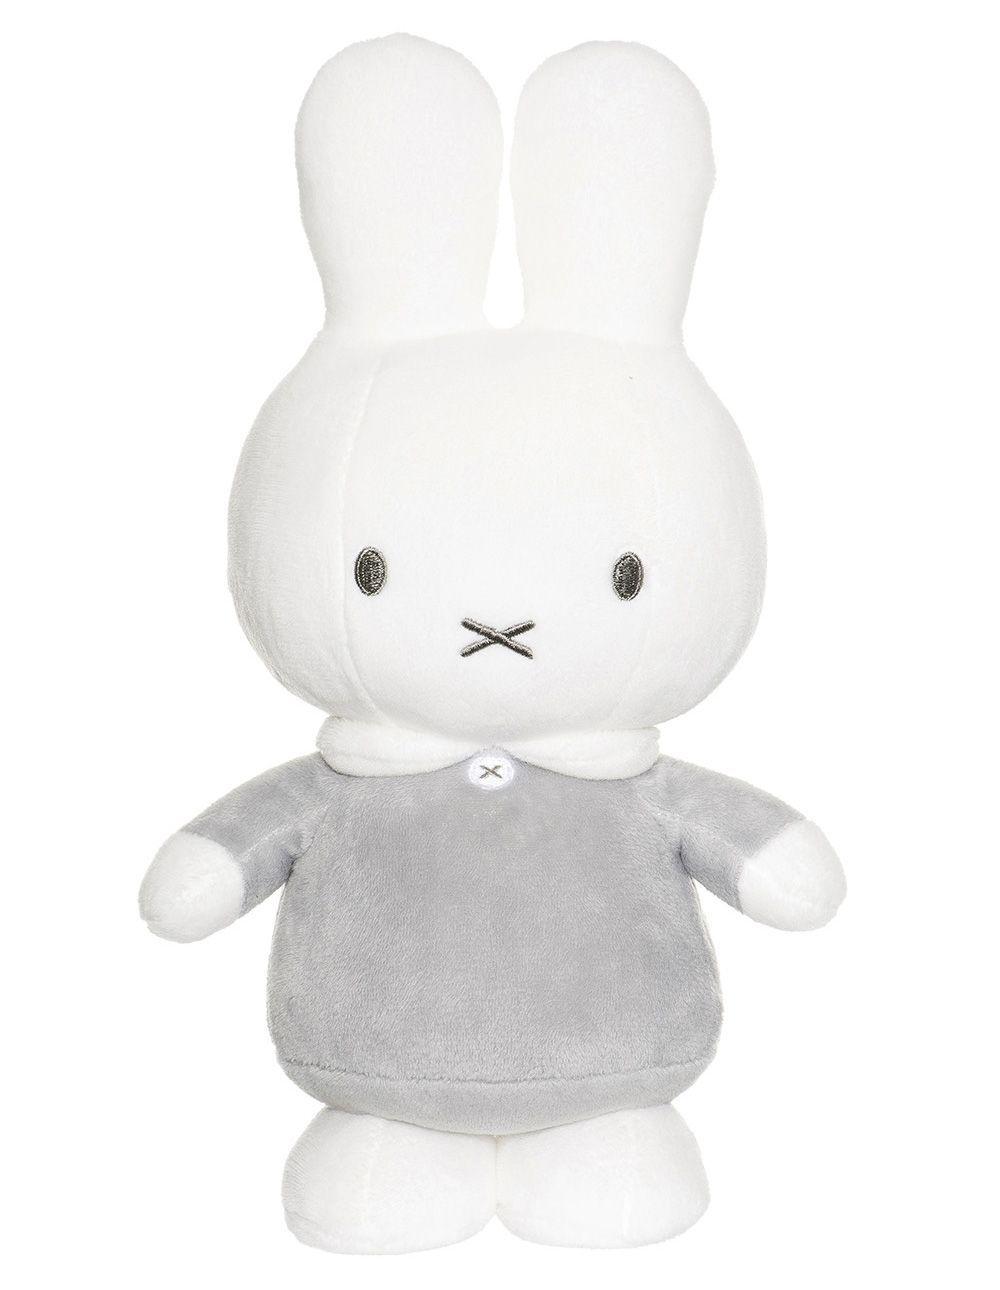 Image of Miffy bamse fra Teddykompaniet - Grå (32 cm) (2731)